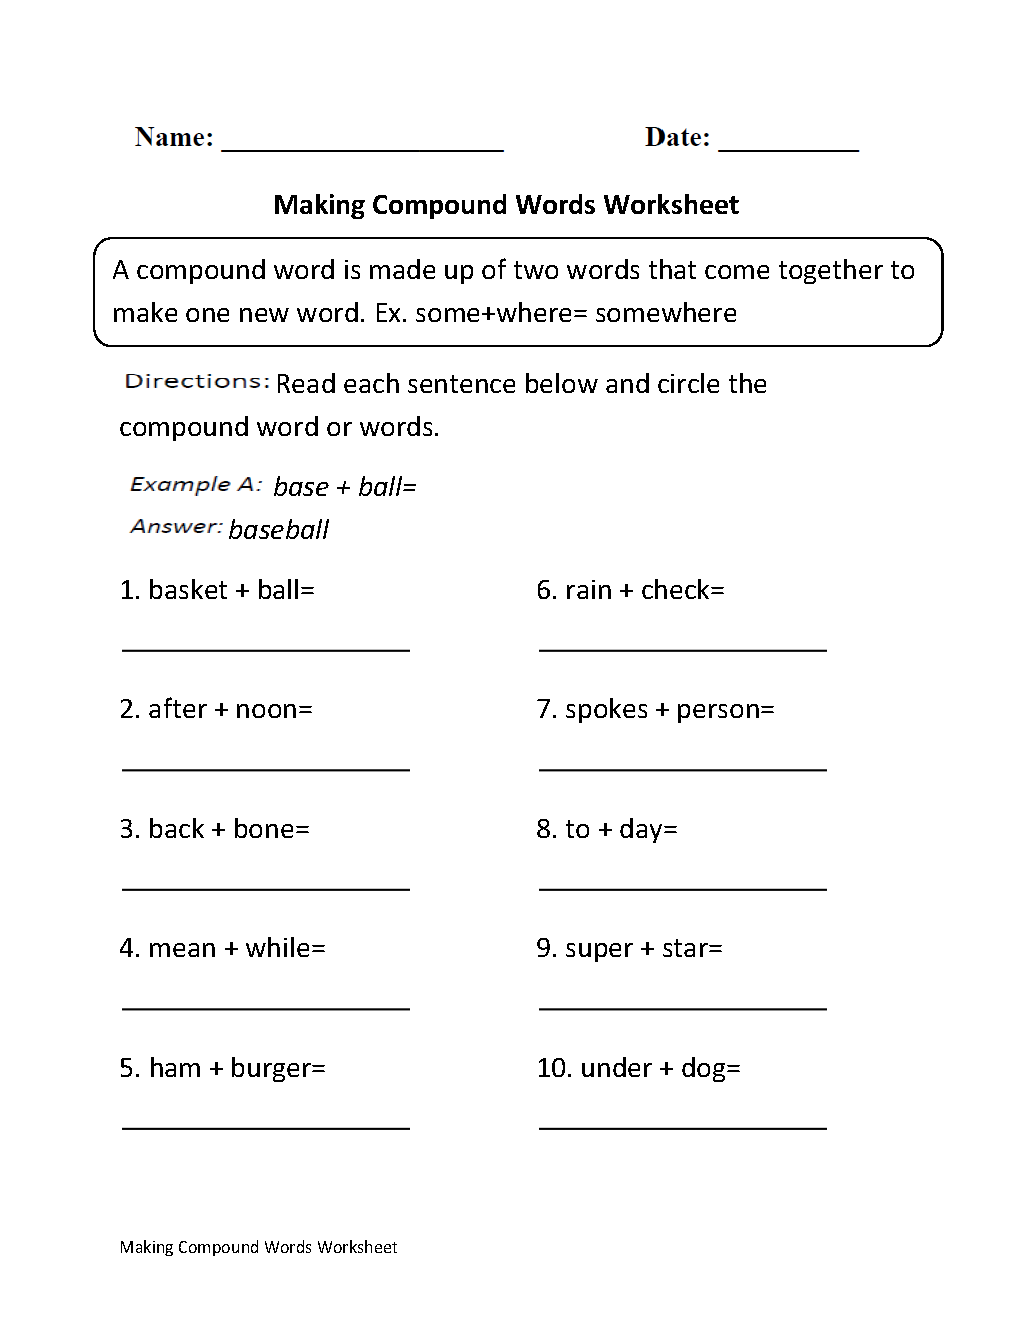 worksheet Making Words Worksheet making compound words worksheet part 1 beginner englishlinx com beginner